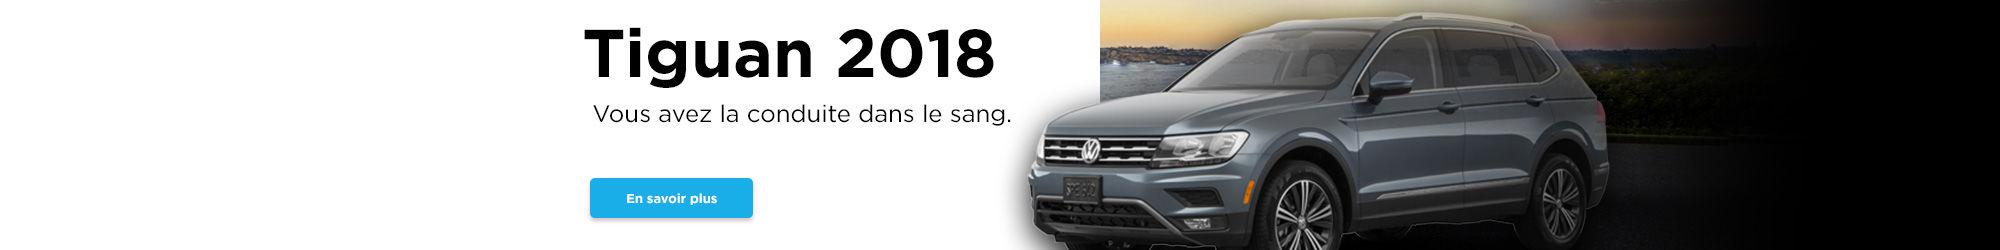 Tiguan 2018